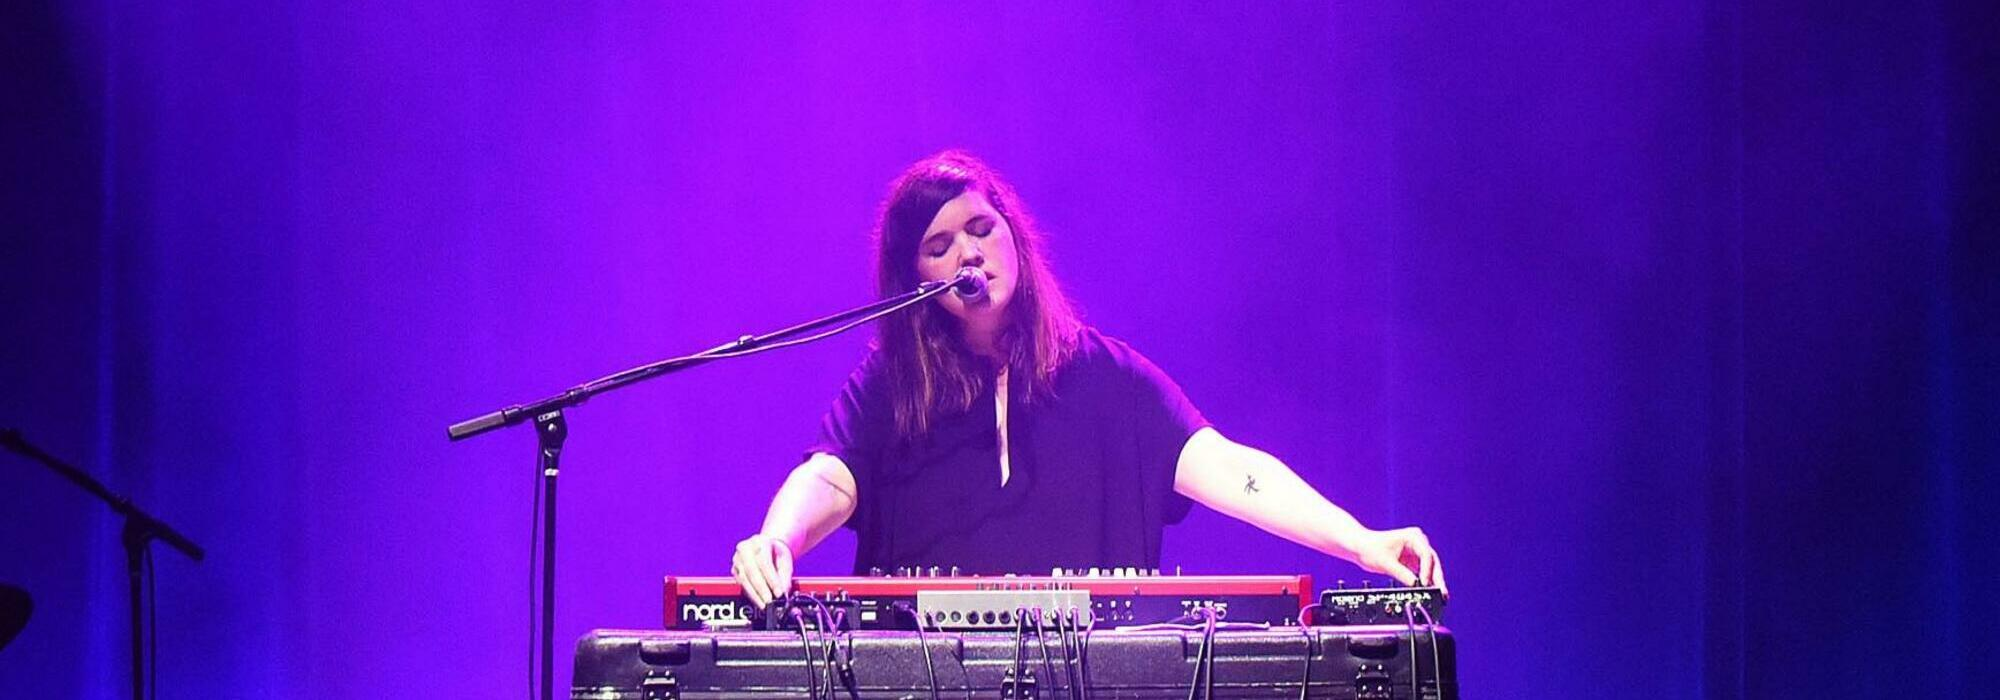 A Julianna Barwick live event